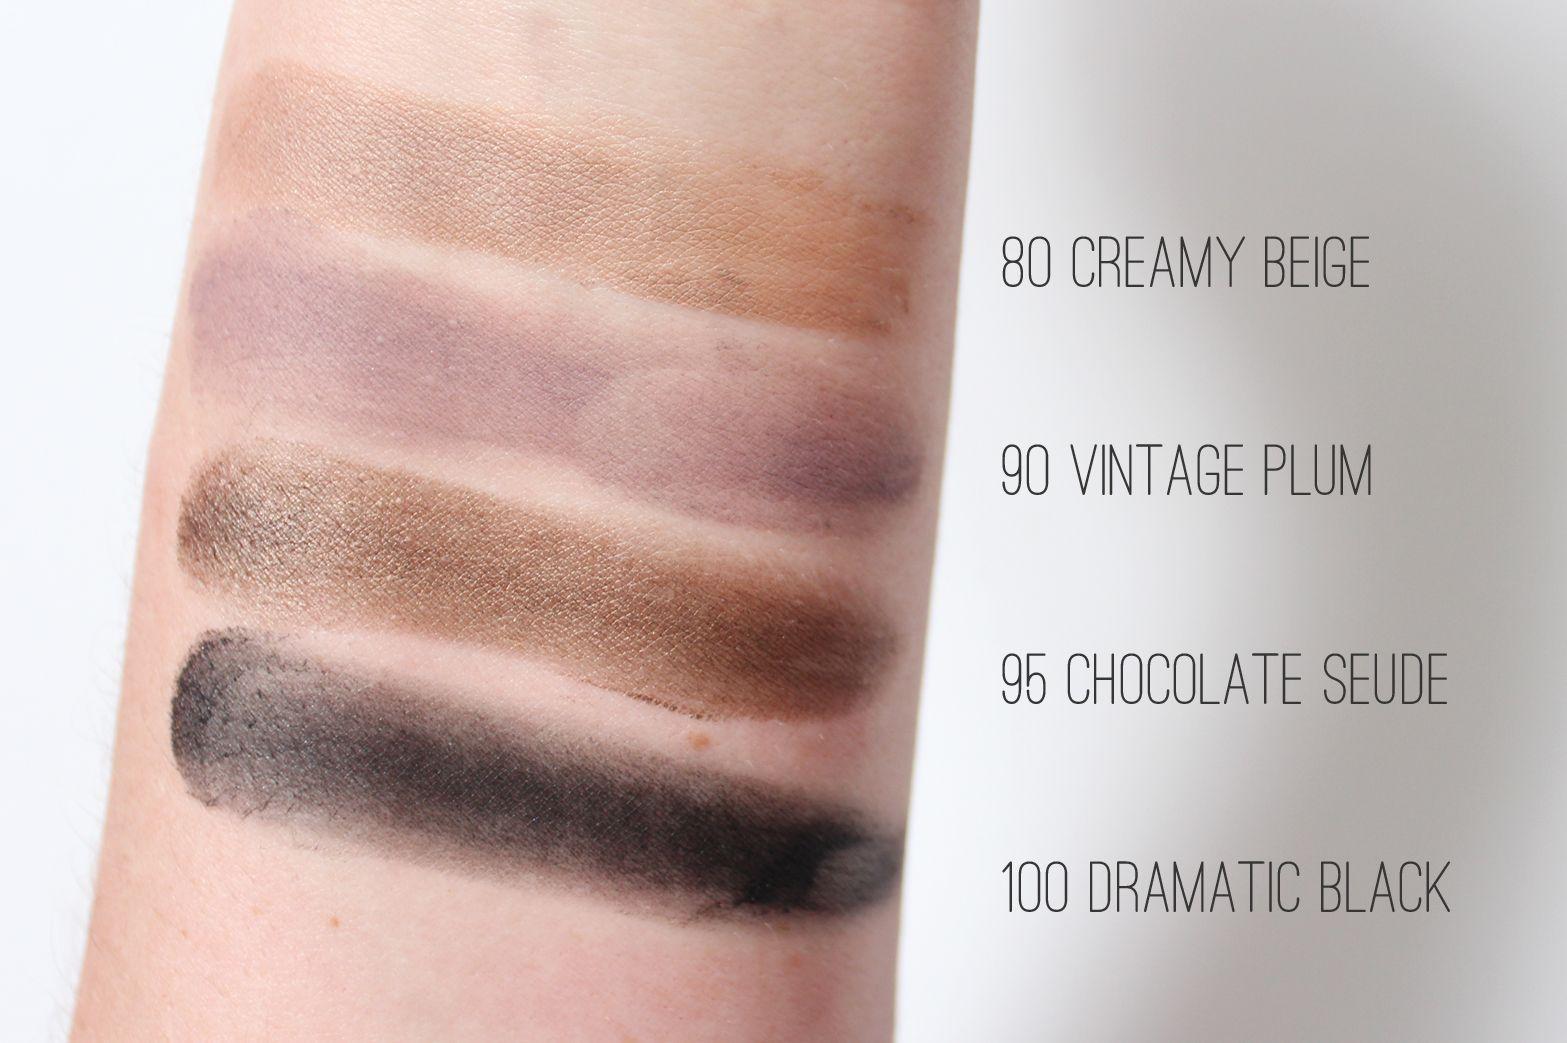 MAYBELLINE Maybelline color tattoo, Tattoo eyeshadow